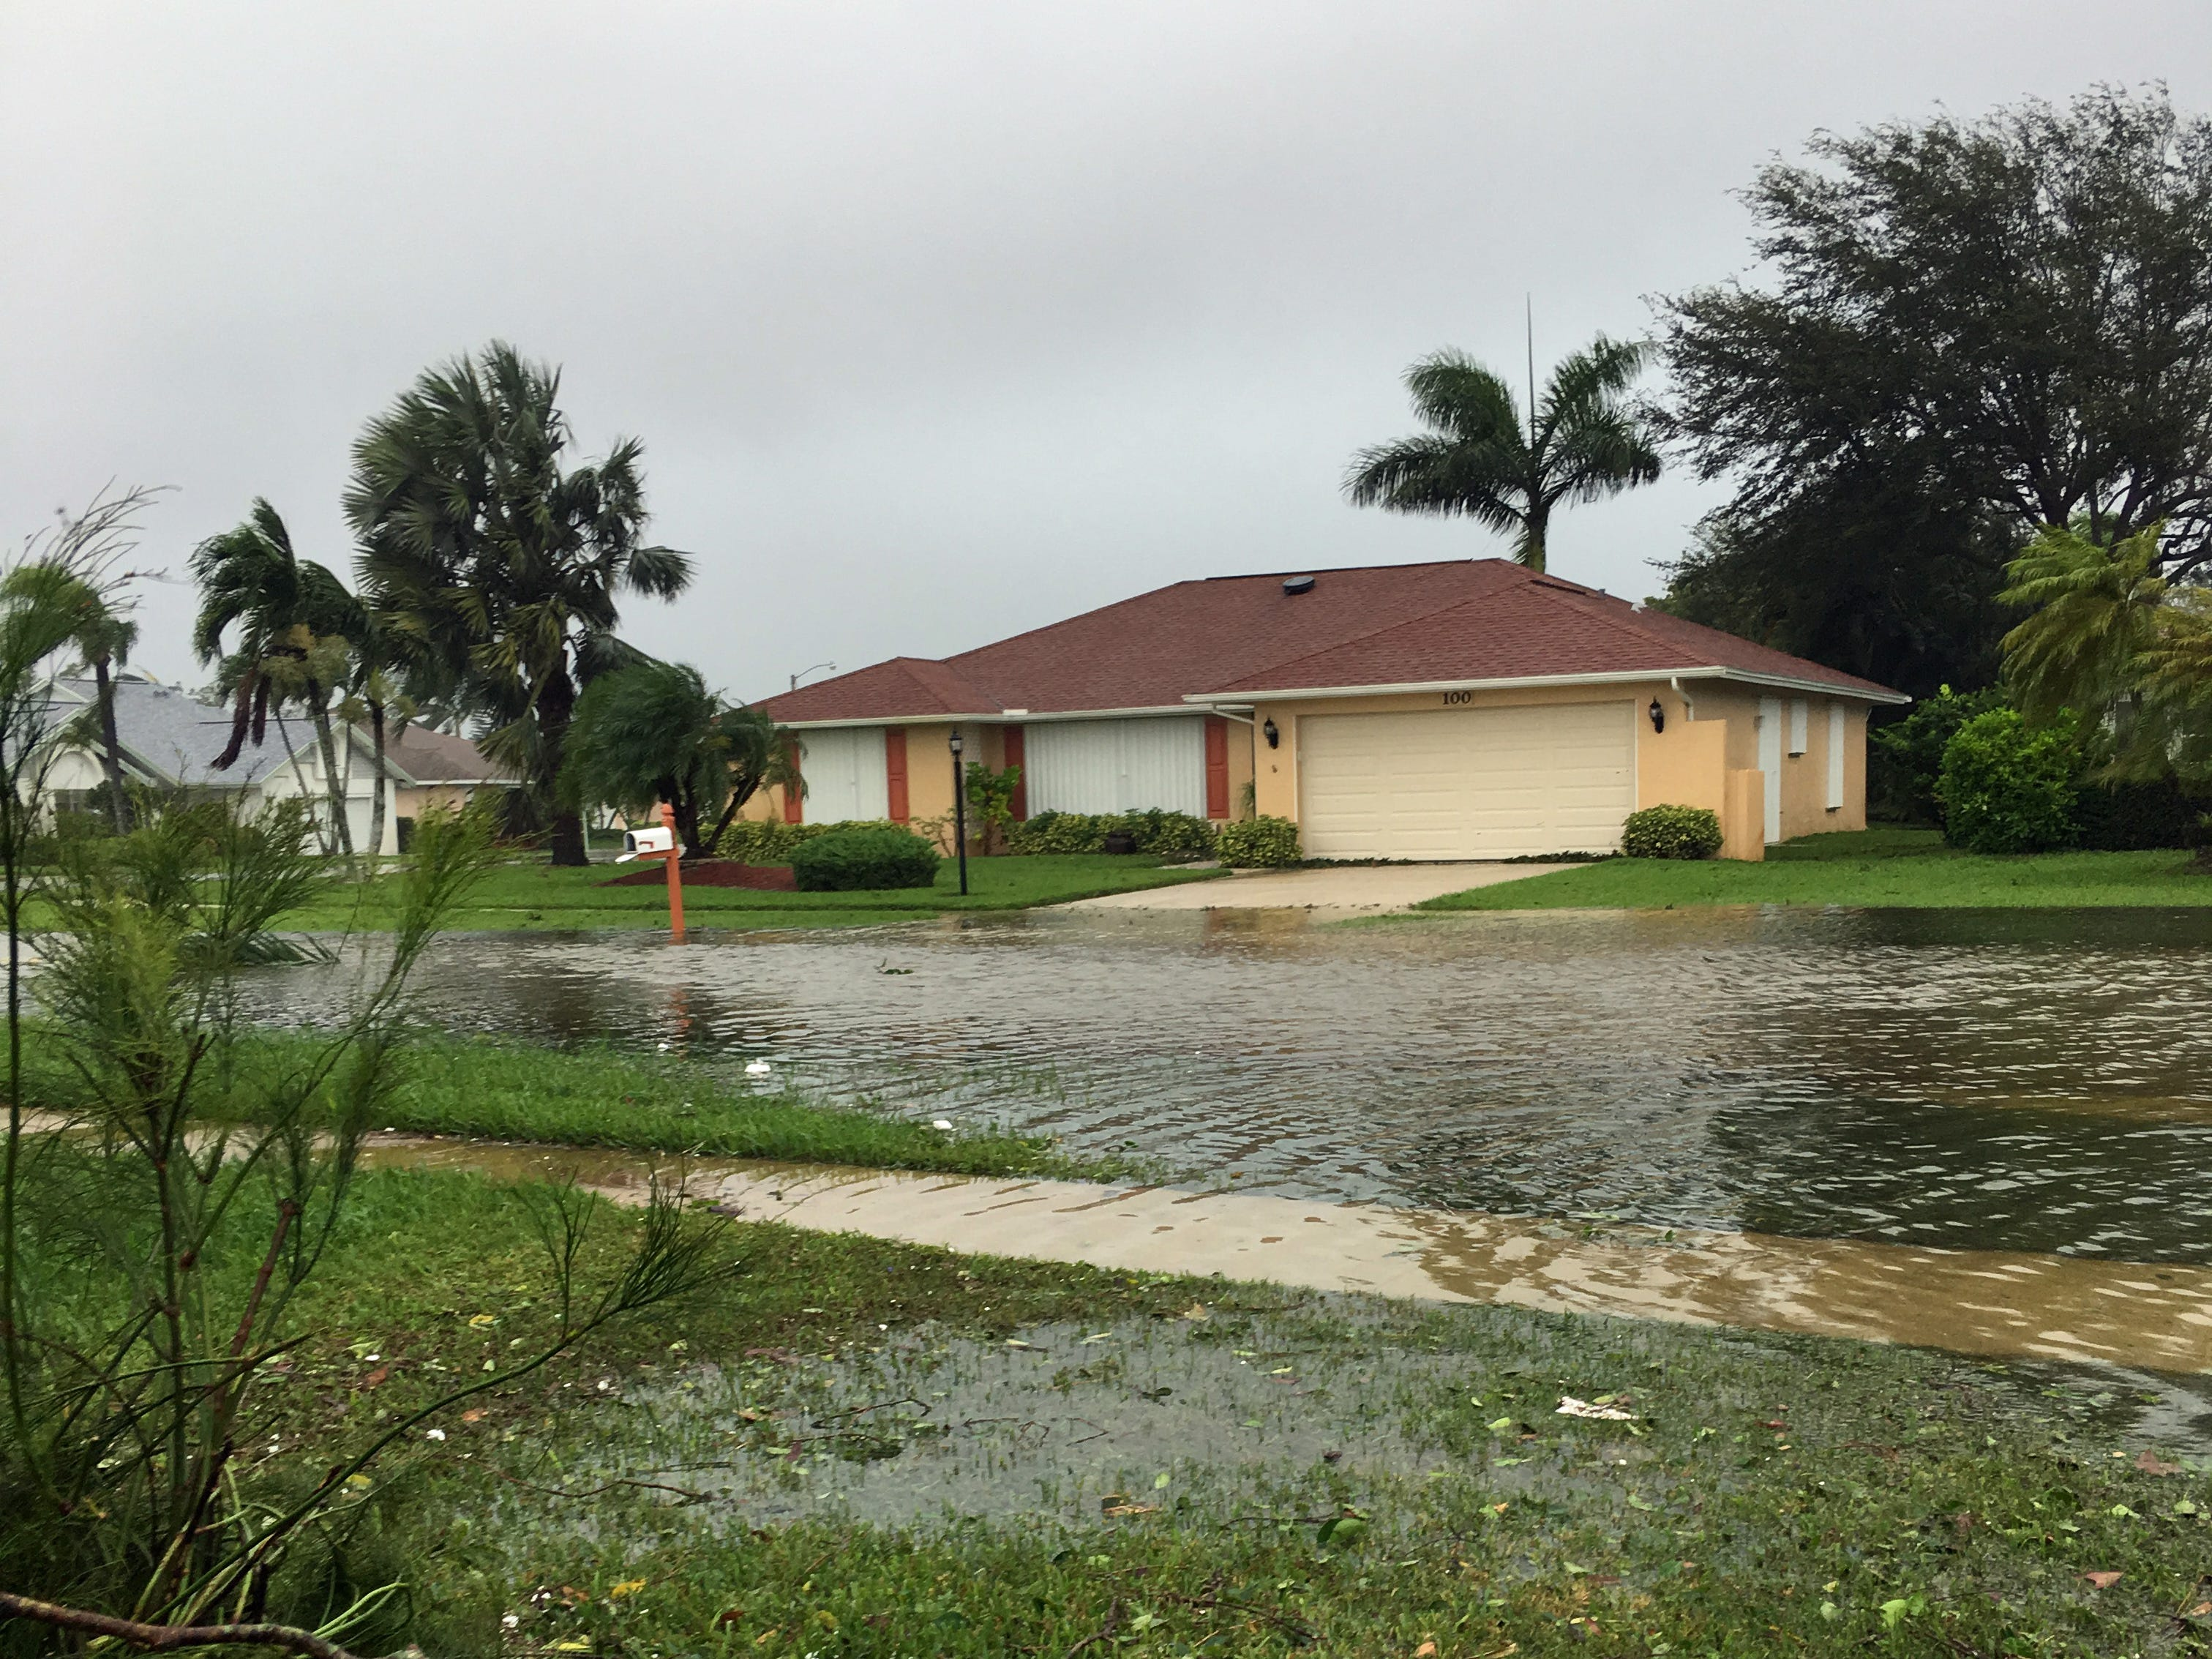 Pam Mullins shared this photo after Hurricane Irma.